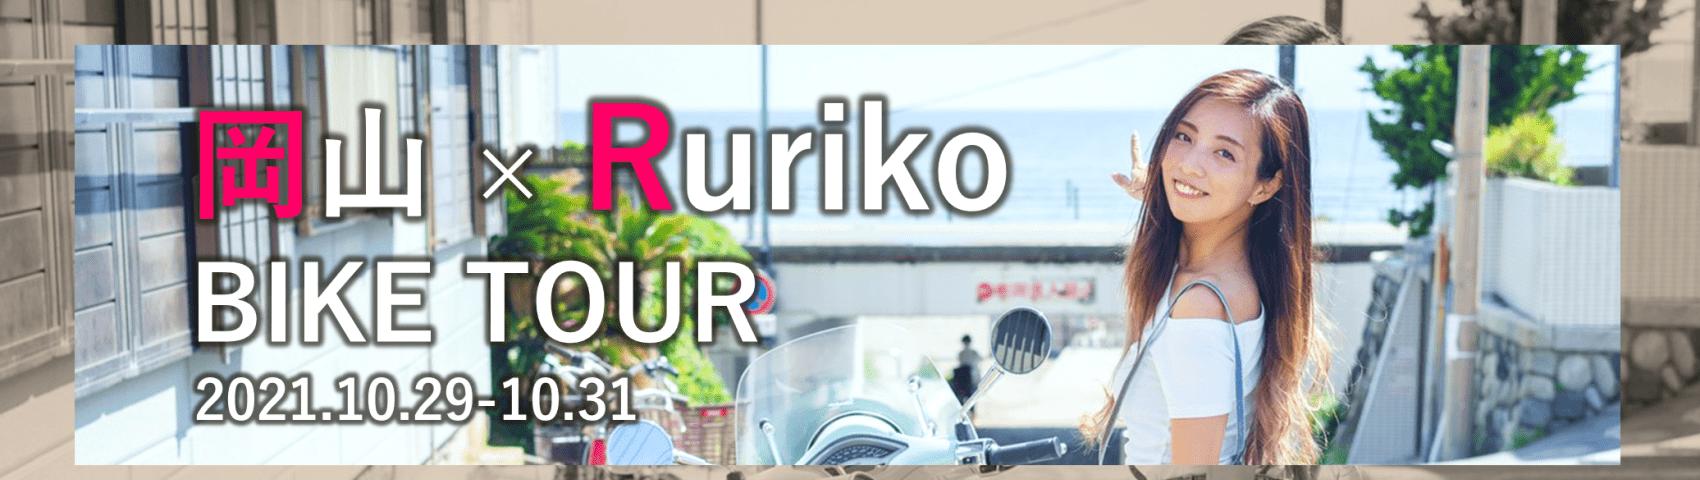 Rurikoと行く!10月岡山発レンタルバイクツアー2泊3日